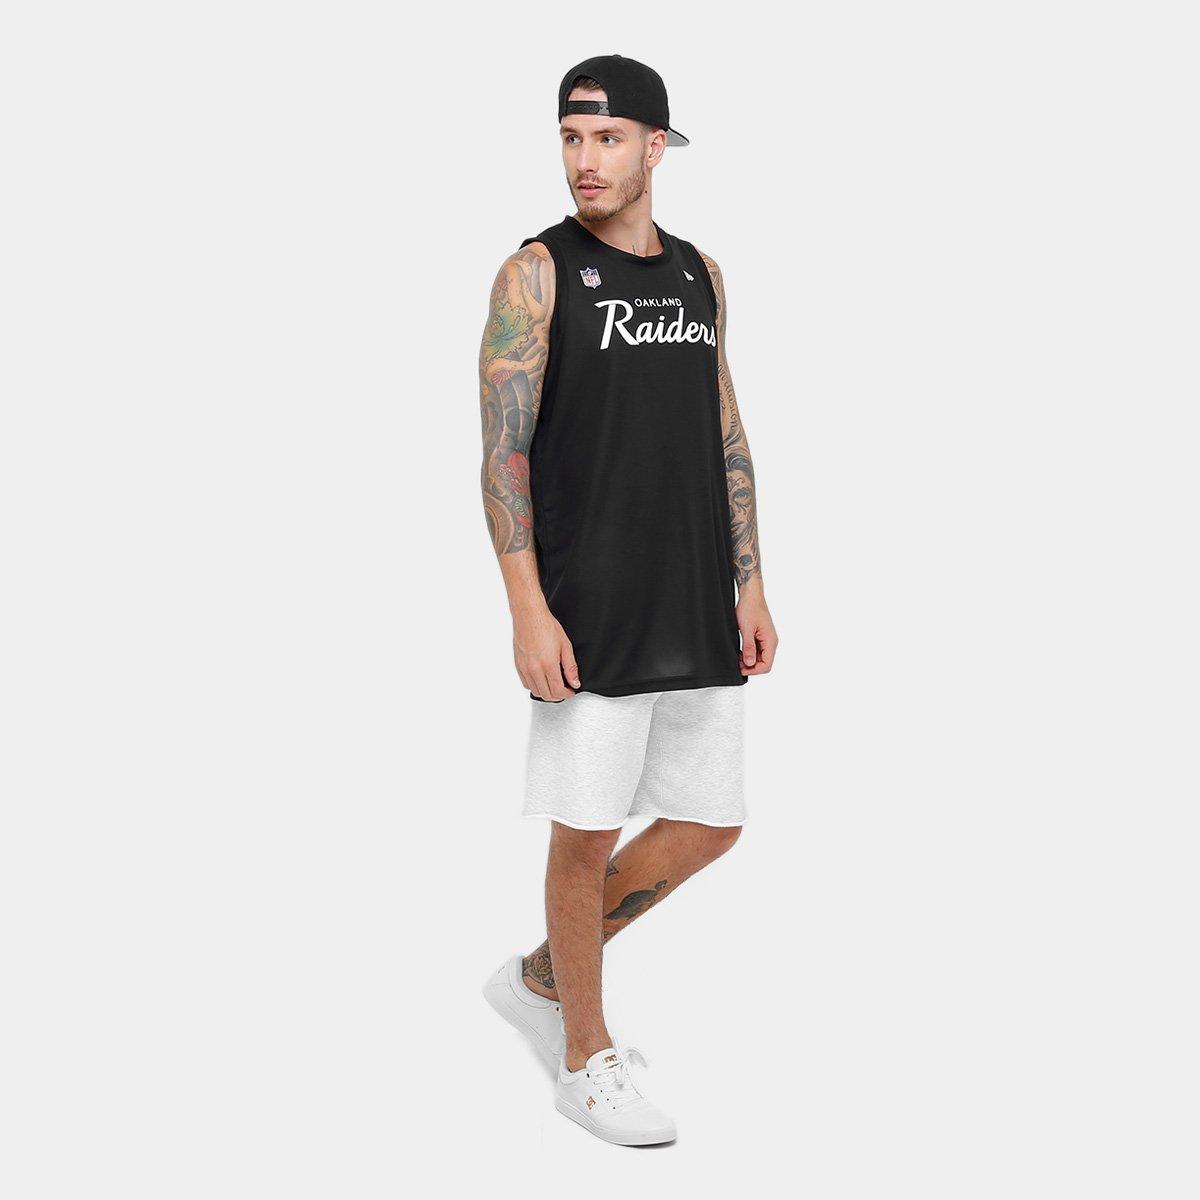 Camiseta Regata New Era NFL Oakland Raiders Sports Vein Masculina ... ad8565cd61768